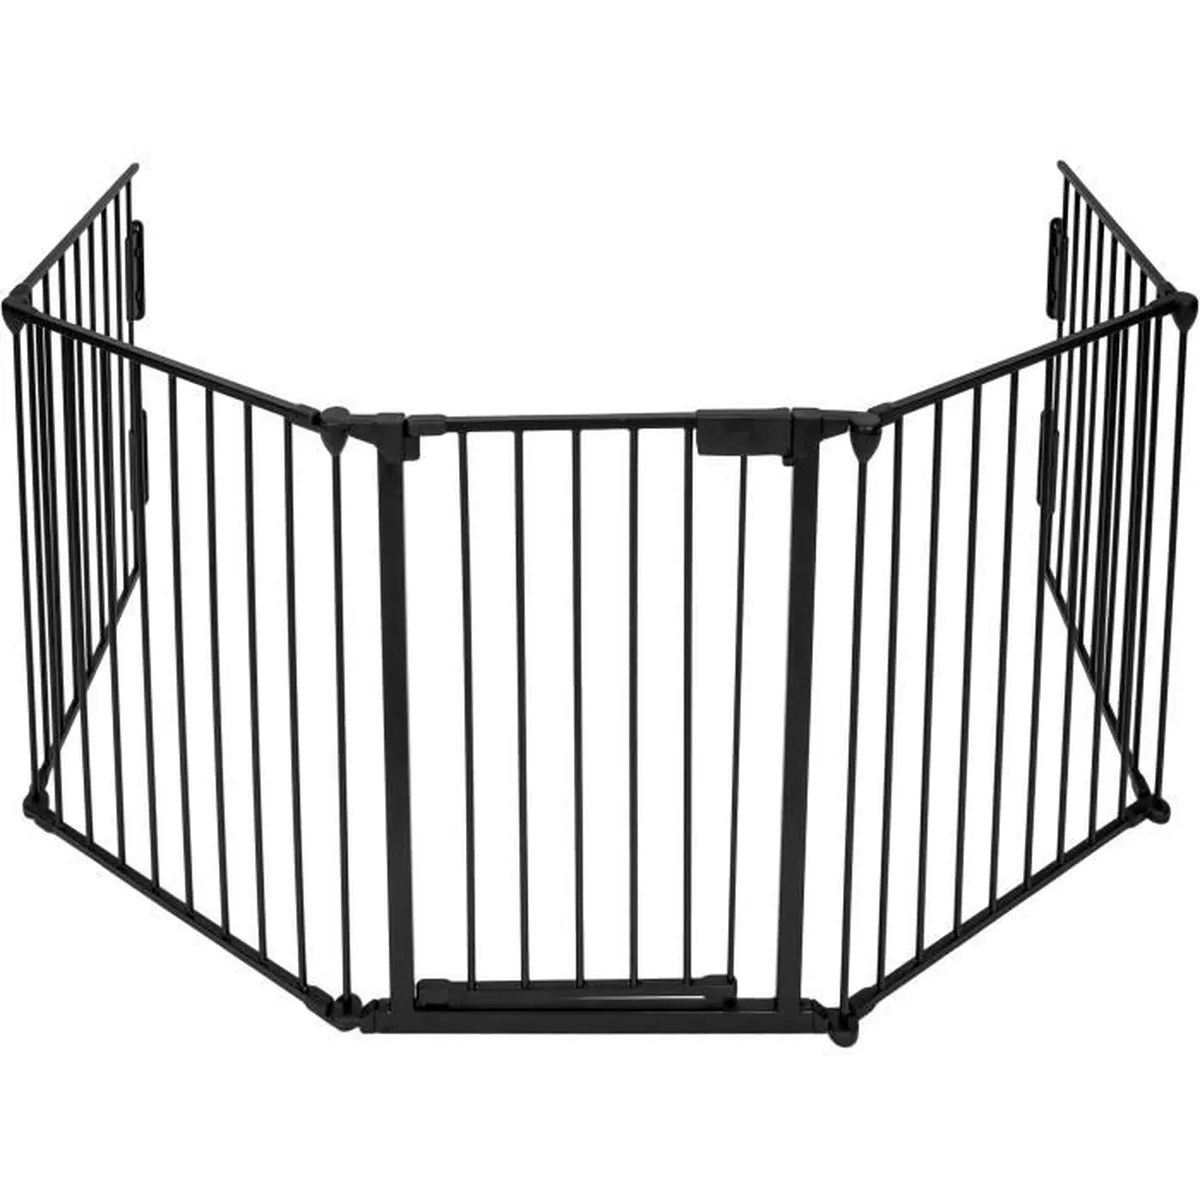 Barriere Securite Poele